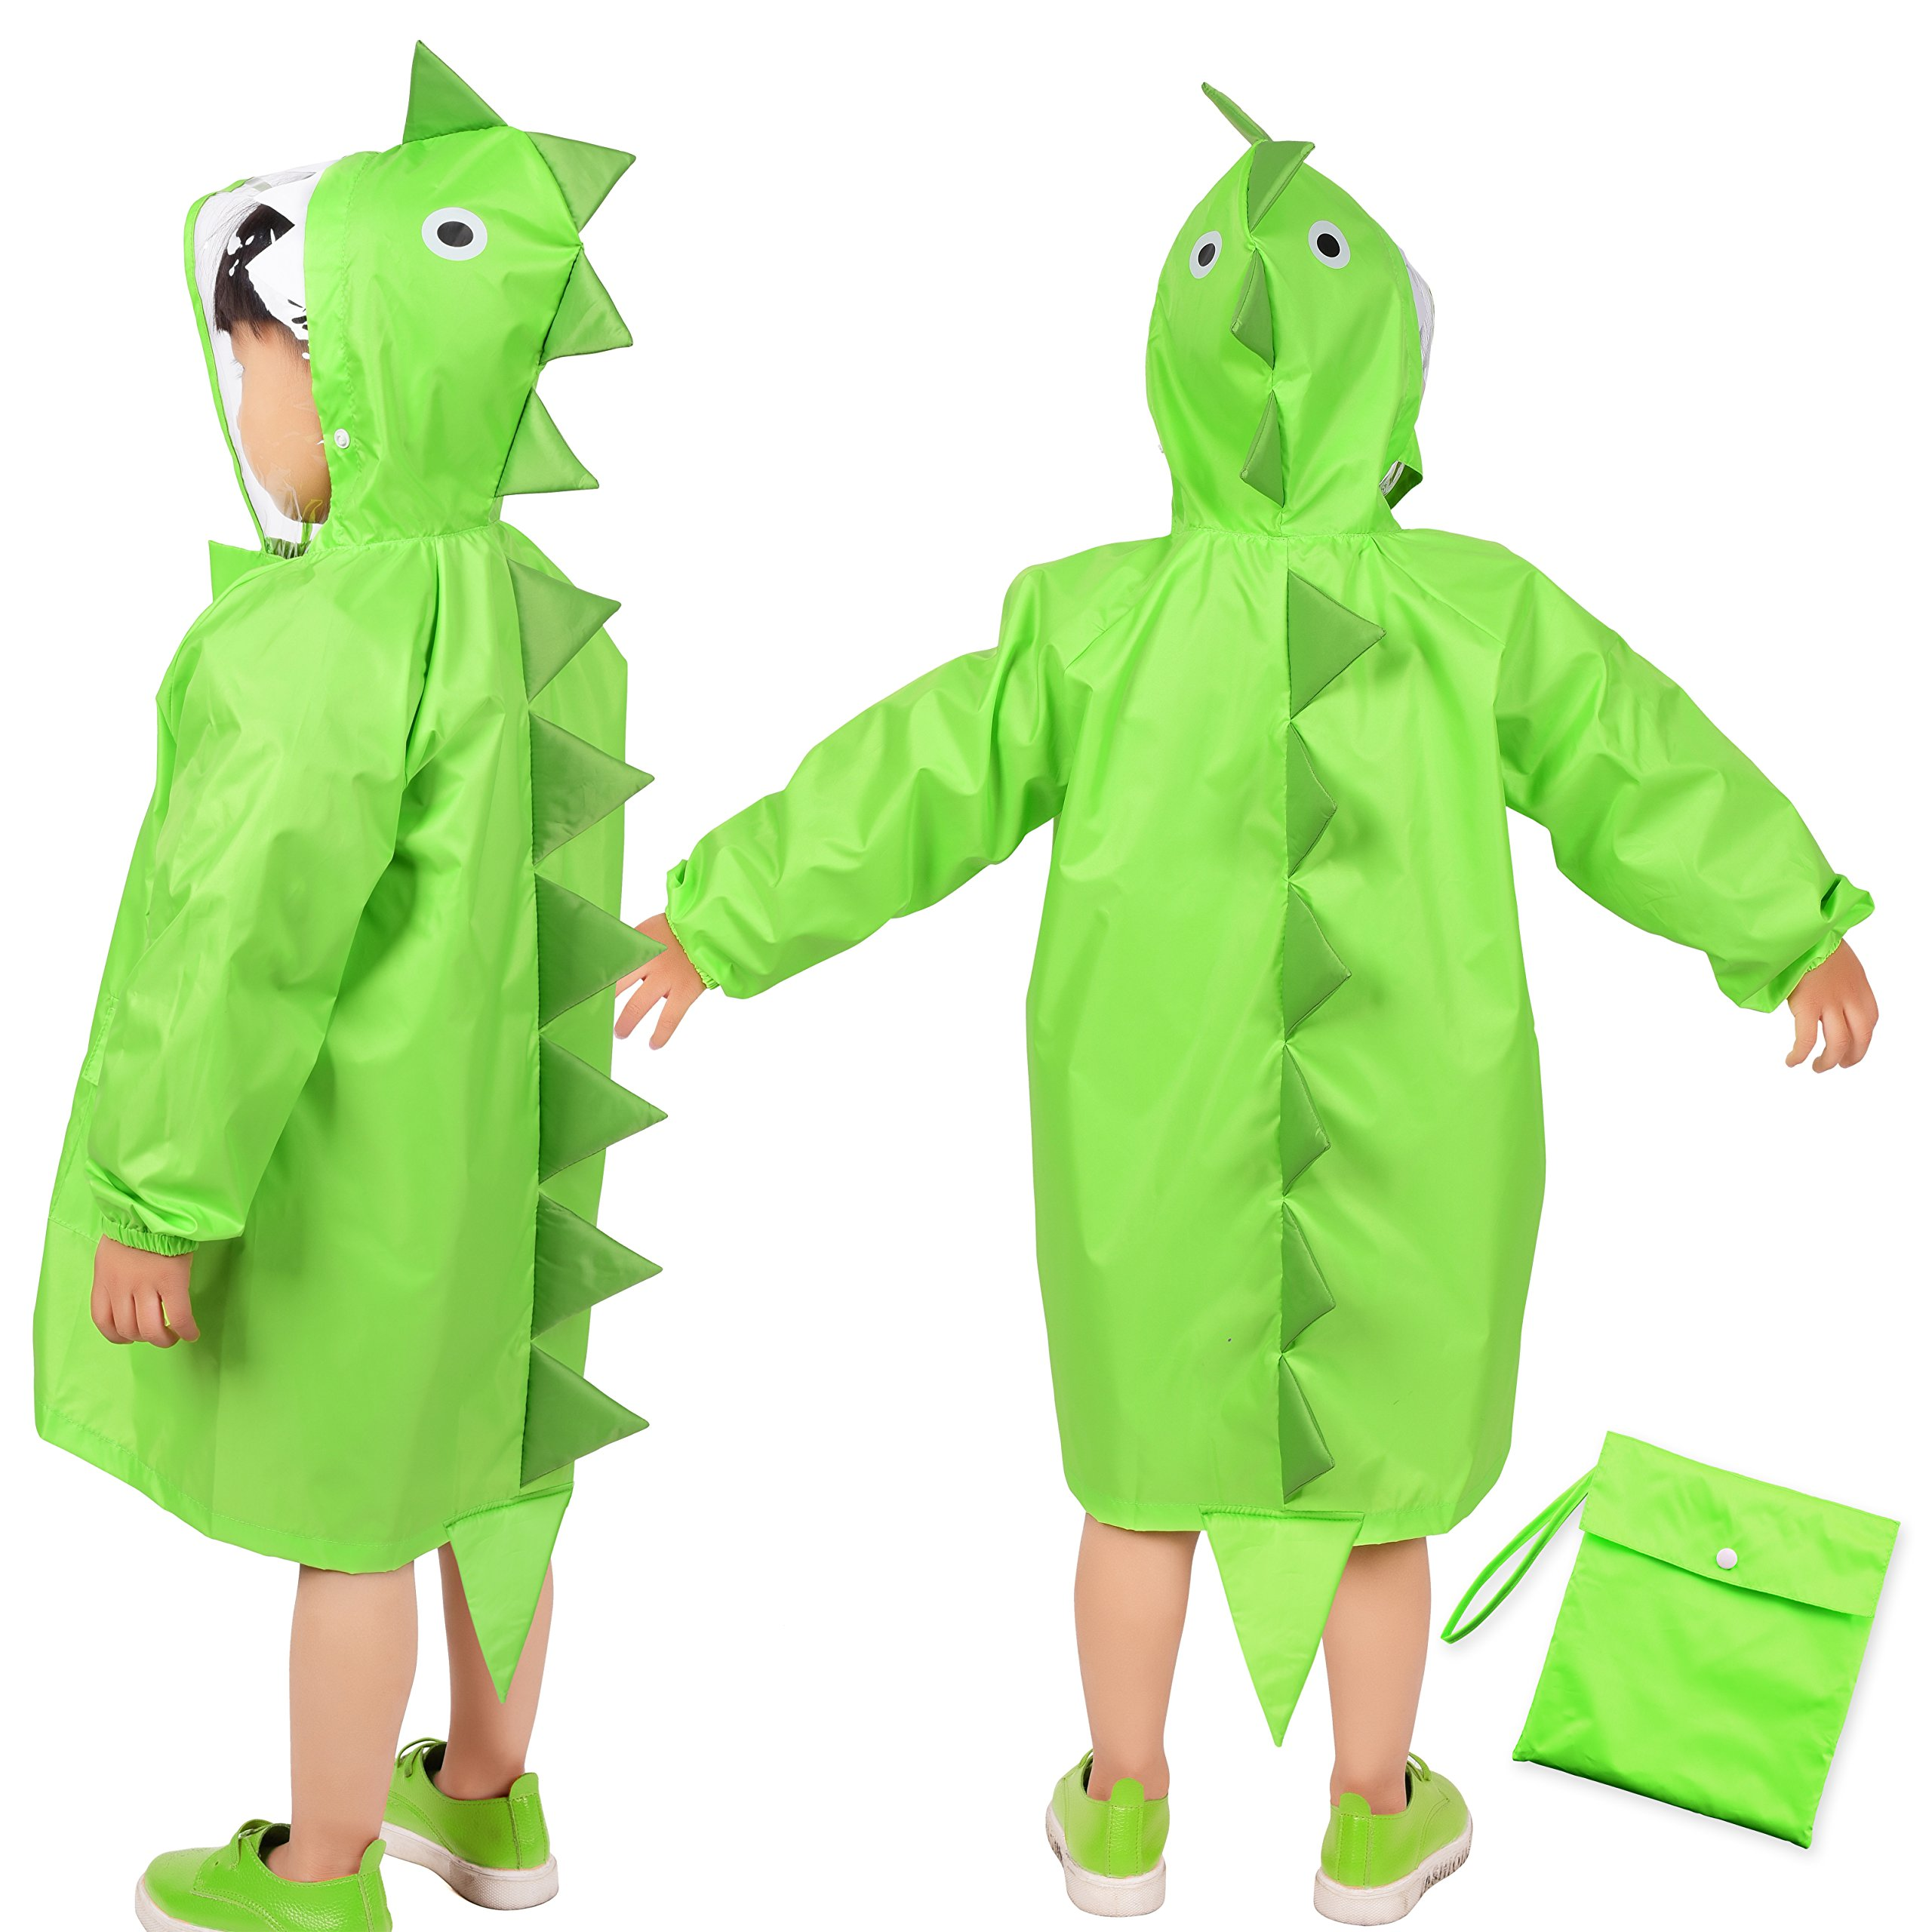 Rainbrace Kids Raincoat, Girls Boys Carton Waterproof Hood Rain Jacket Age 4-6